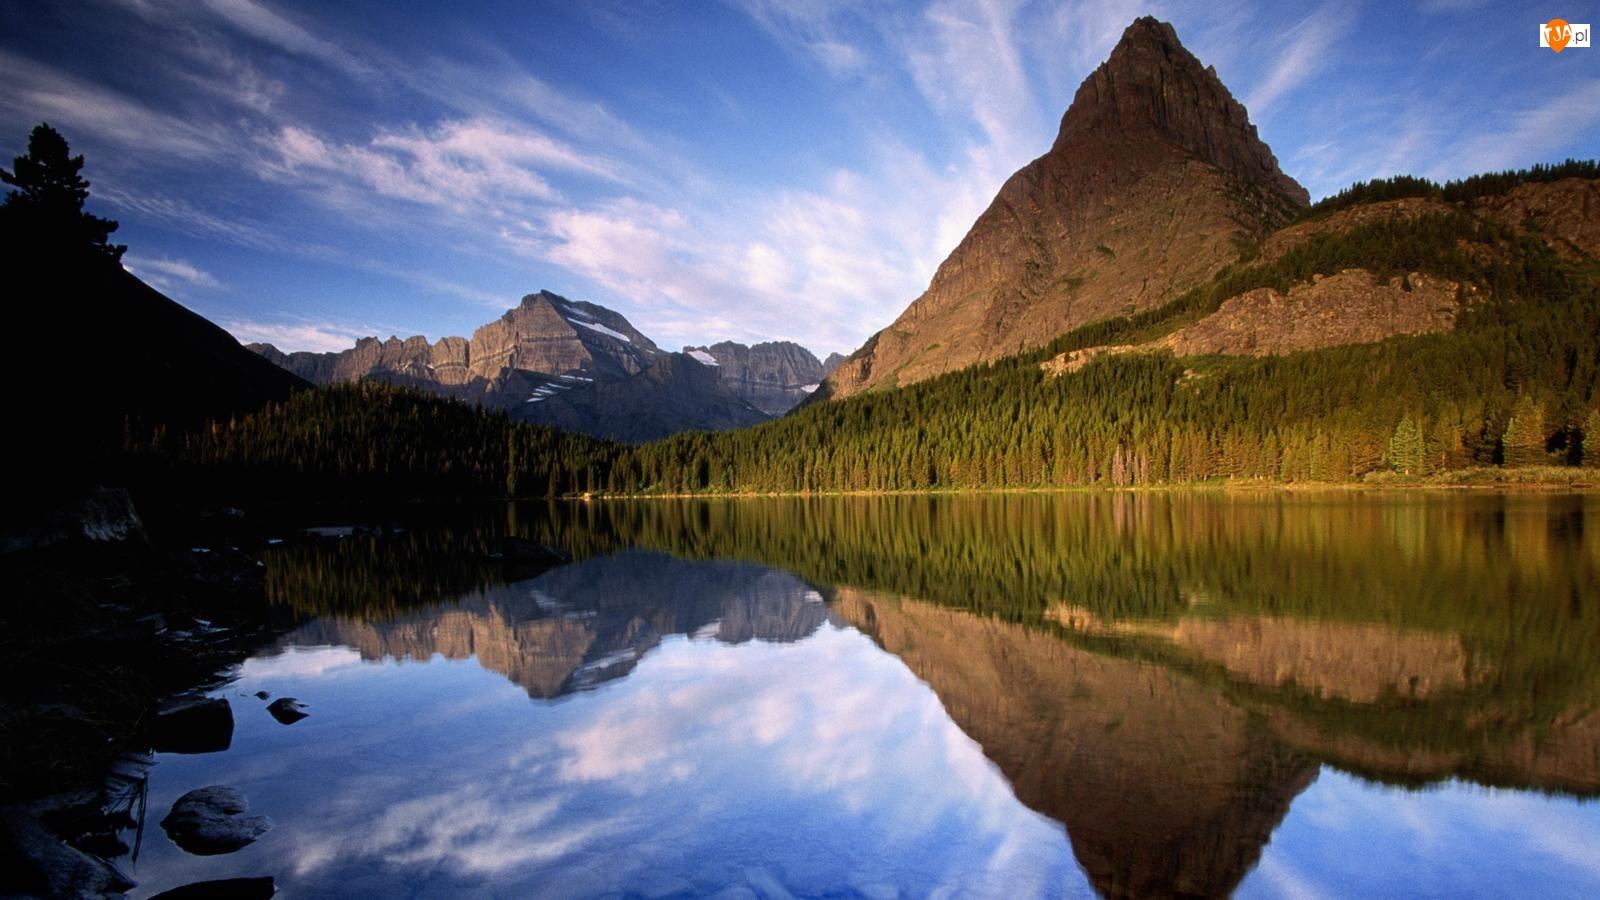 Jezioro, Gór, Lustrzane, Odbicie